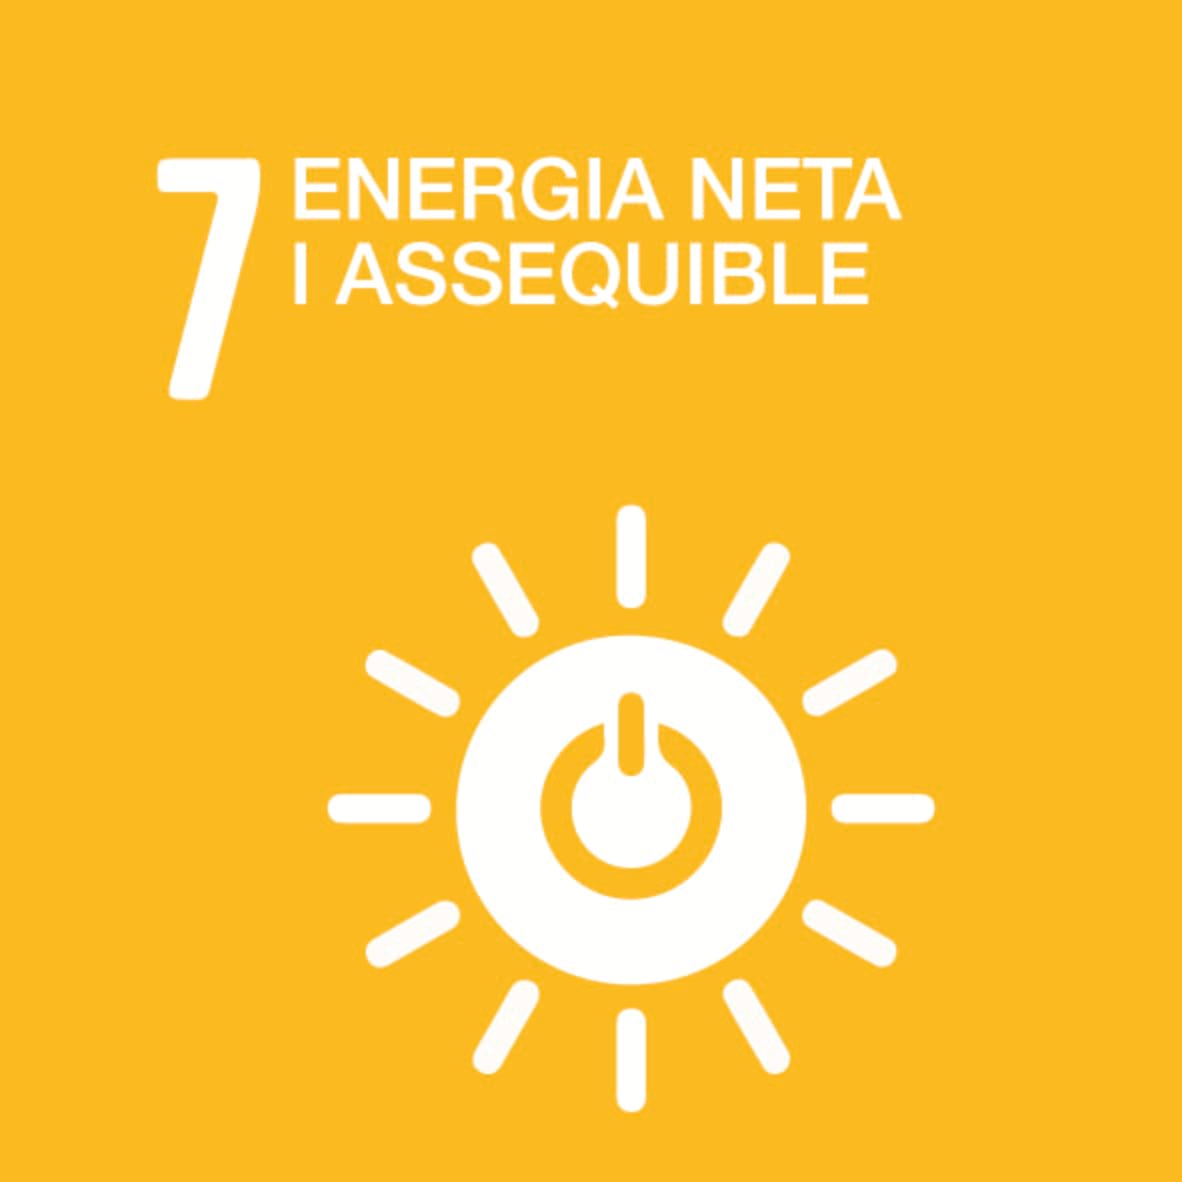 Energia neta i assequible - ODS - Diputació de Barcelona